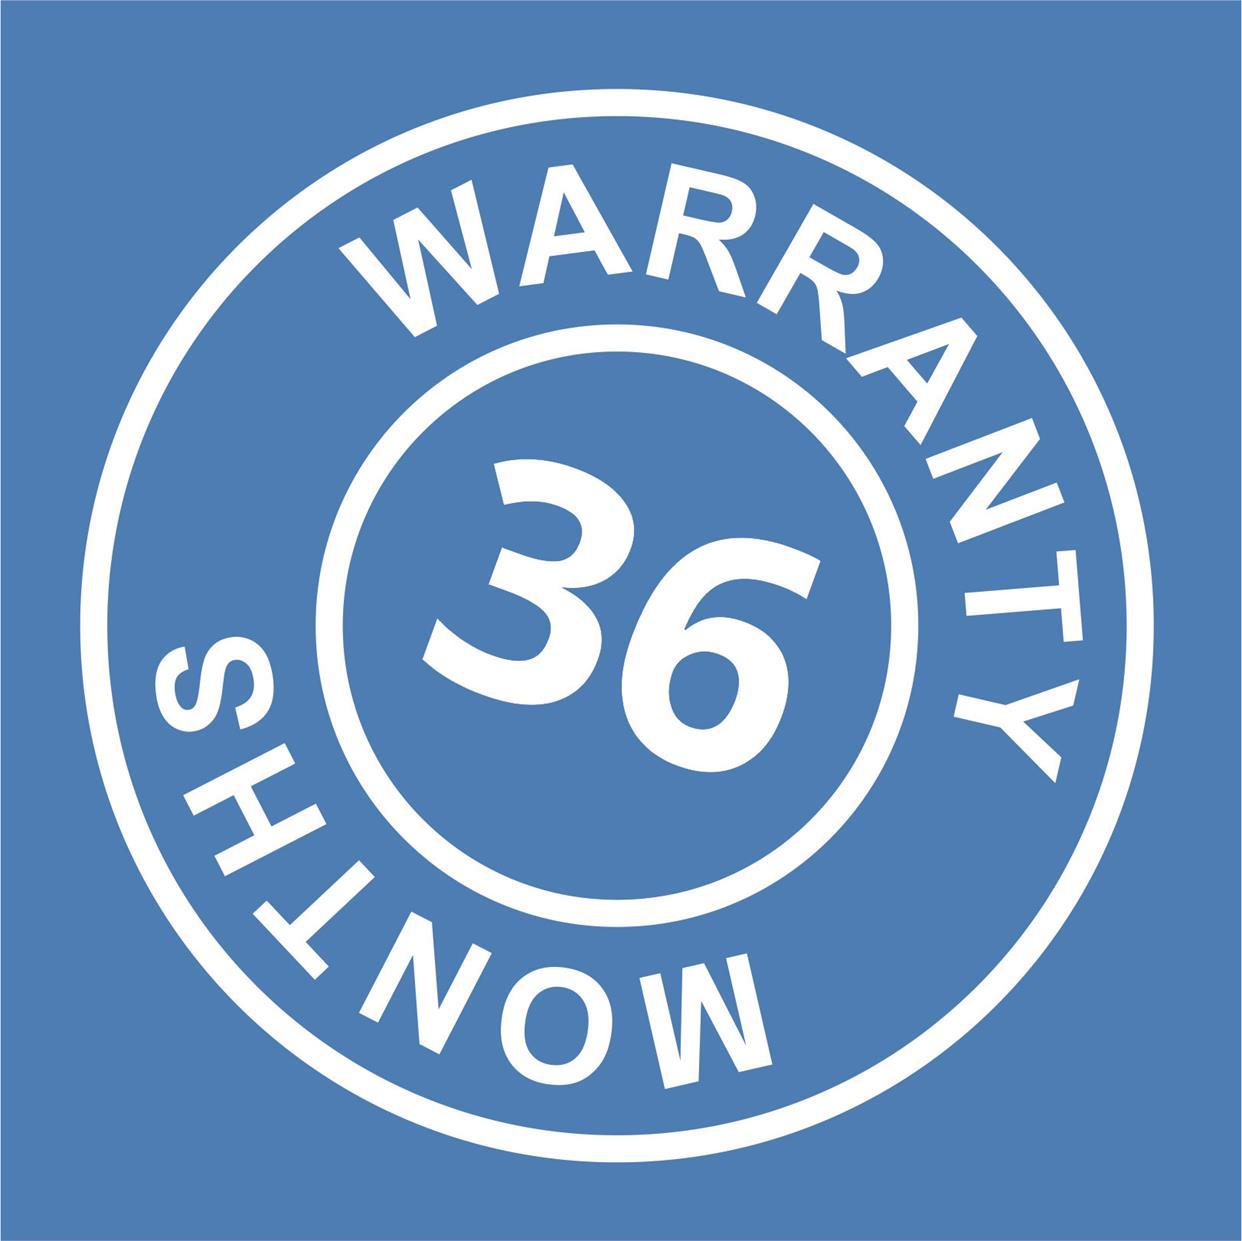 WARRANTY 36MSC-ANG